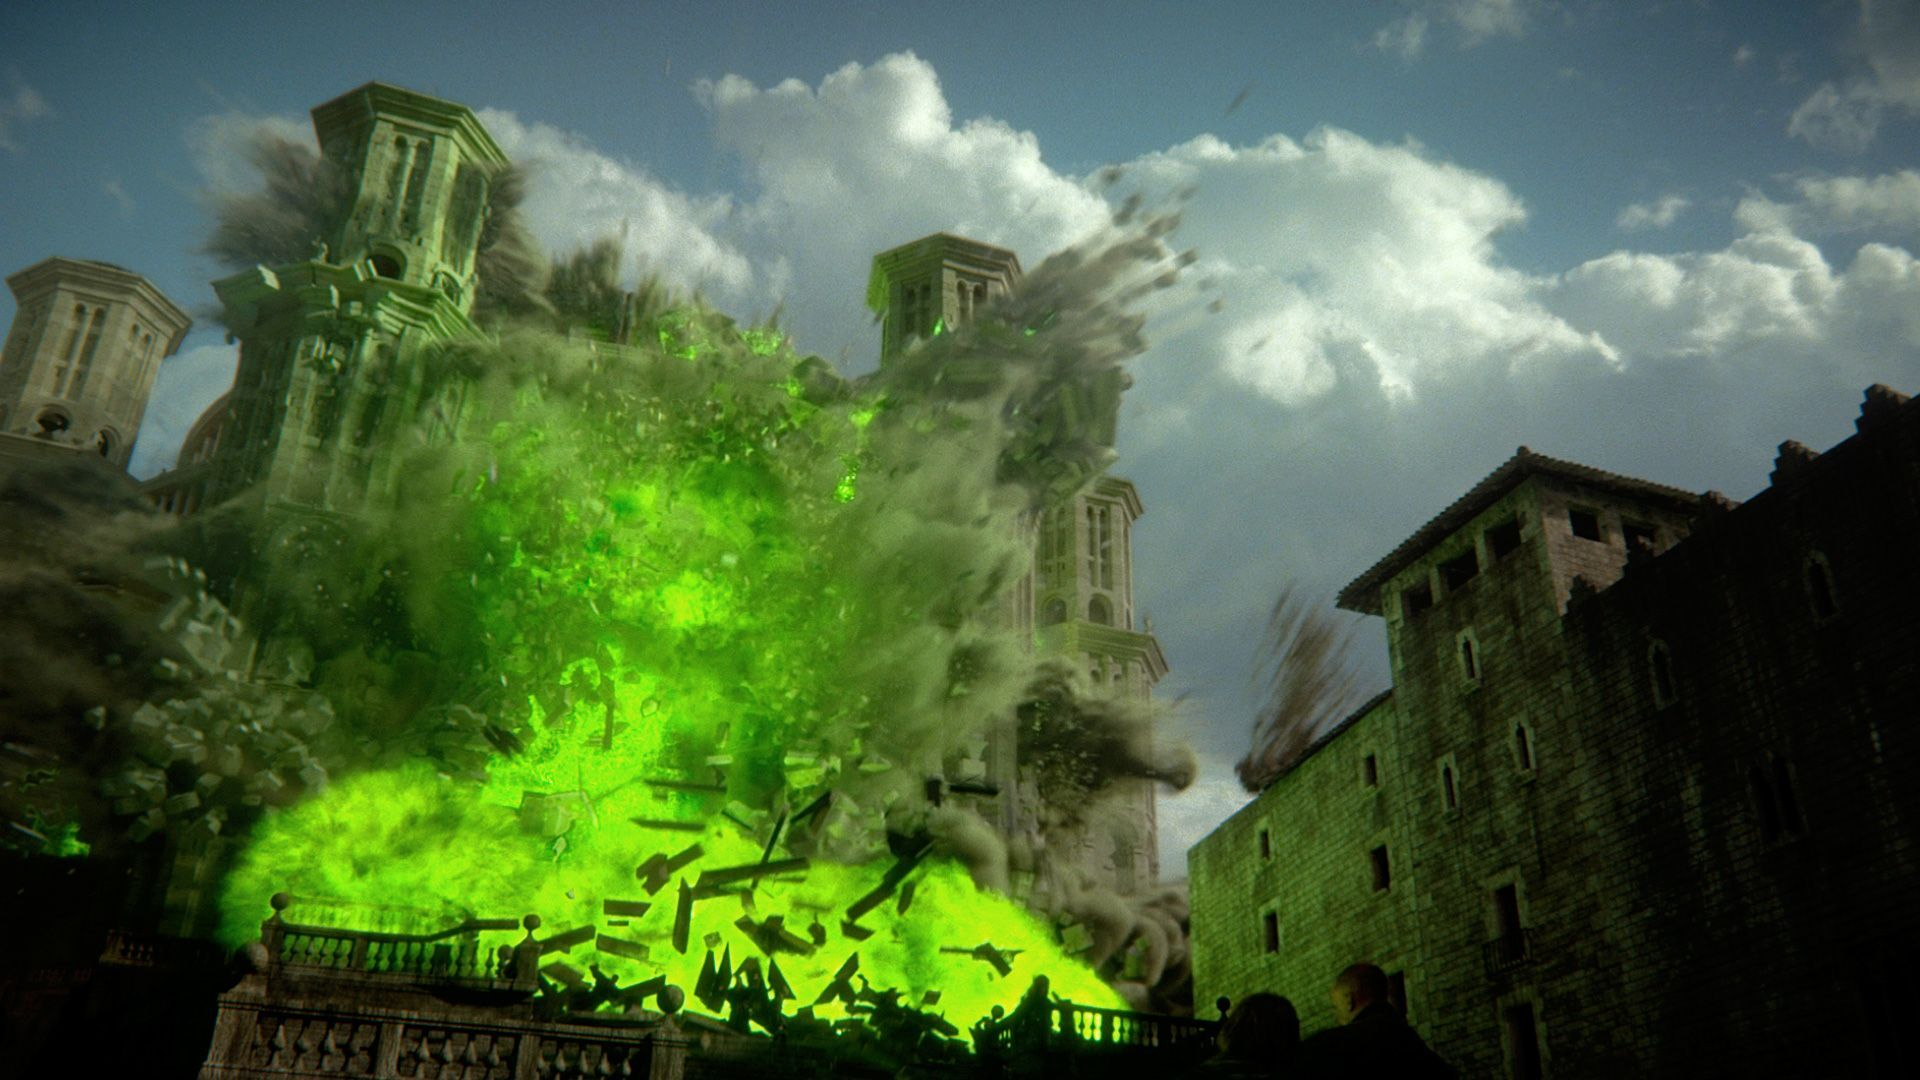 Game of Thrones writer Bryan Cogman names his 21 favorite episodes